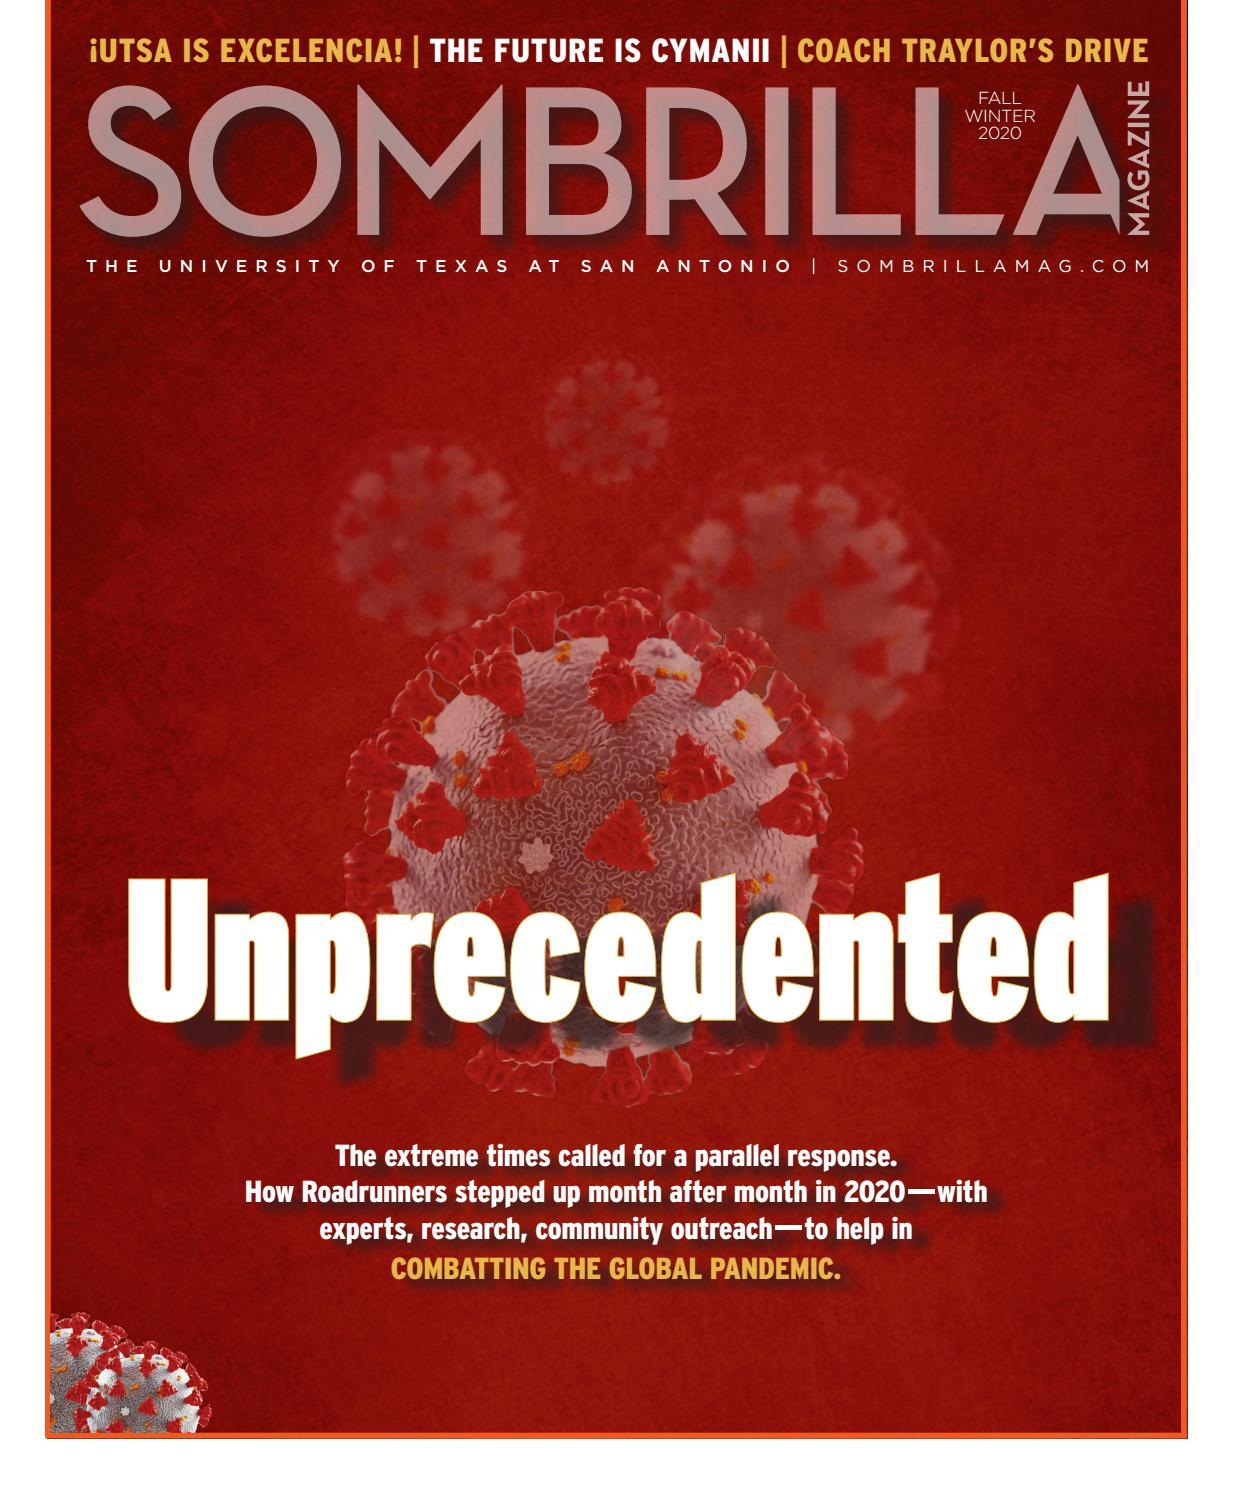 Utsa Academic Calendar Fall 2022.Sombrilla Magazine Fall Winter 2020 By Utsa The University Of Texas At San Antonio Issuu